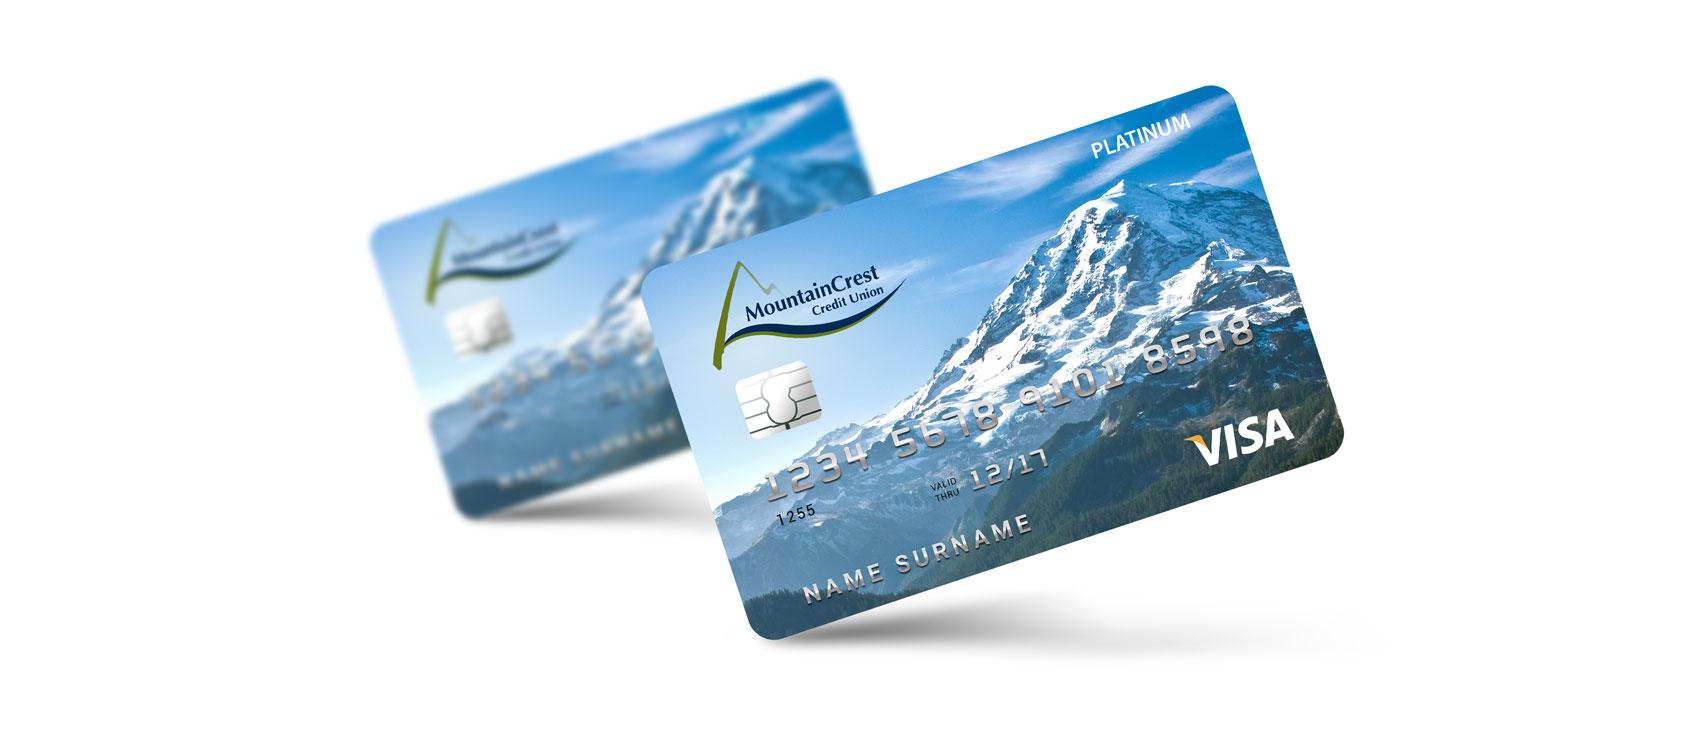 Visa card Design for MountainCrest Credit Union